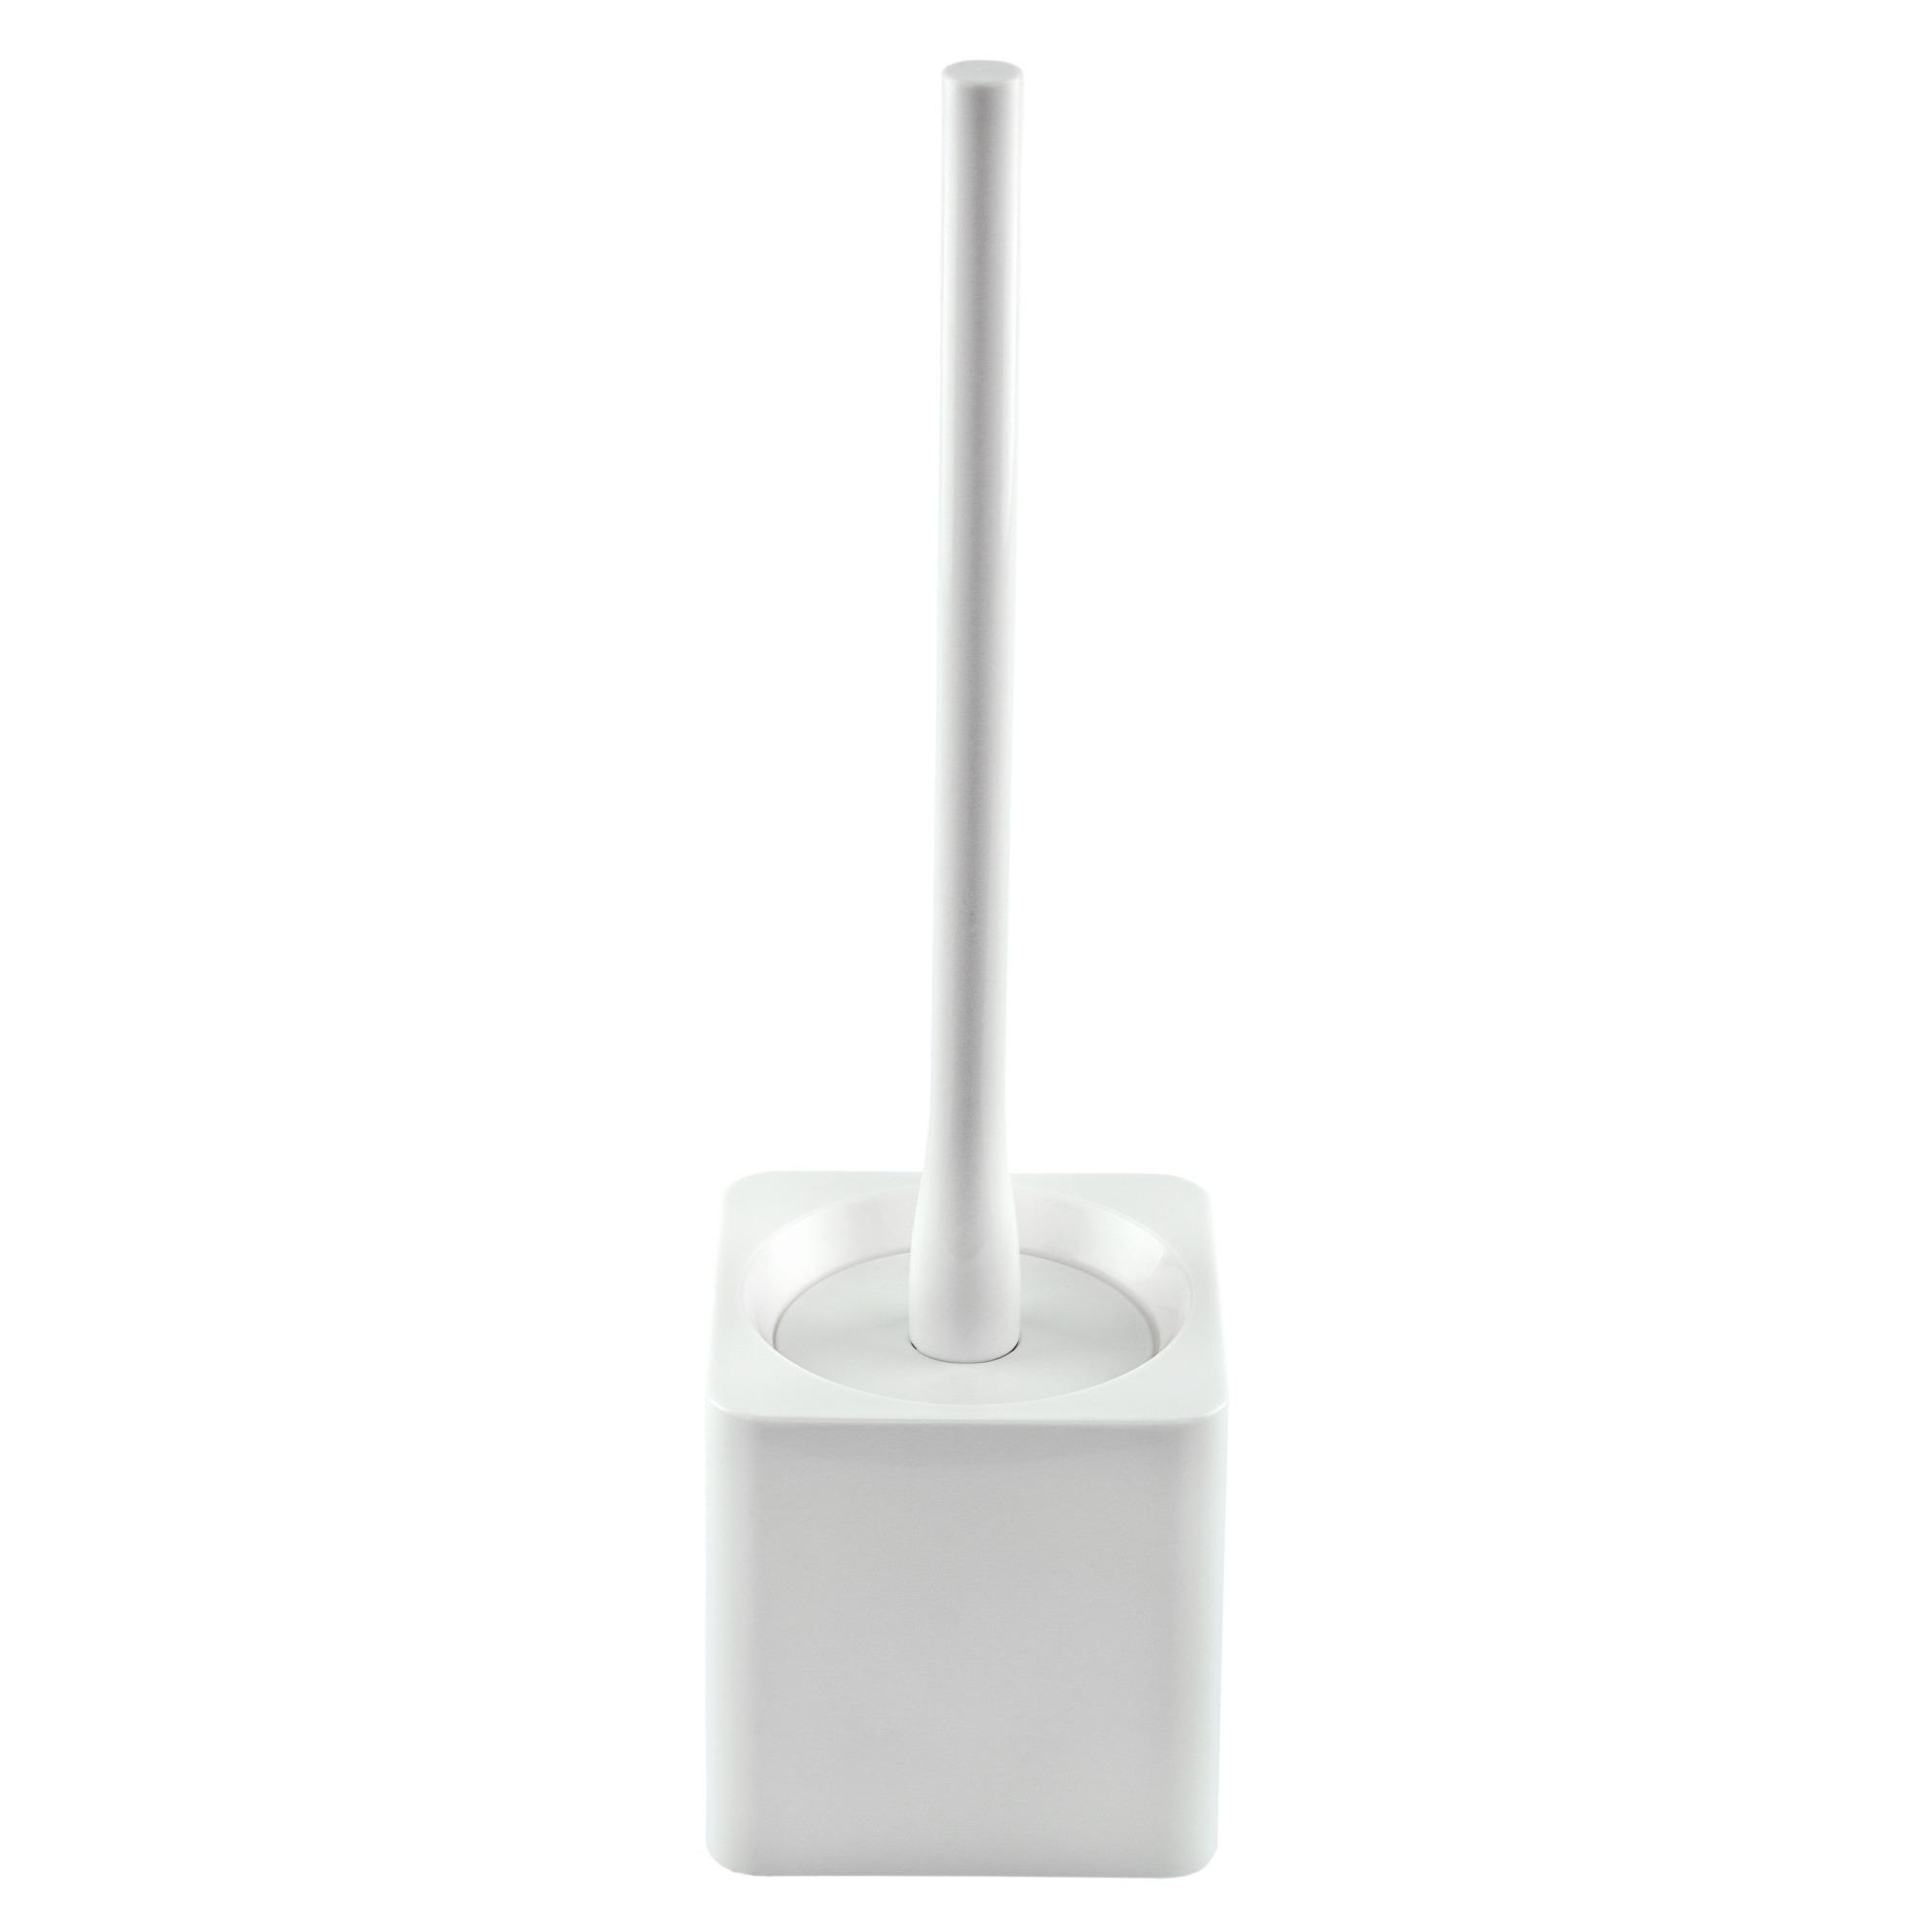 Escova Sanitaria Plastica Branca com Suporte 917002 - Bianchini